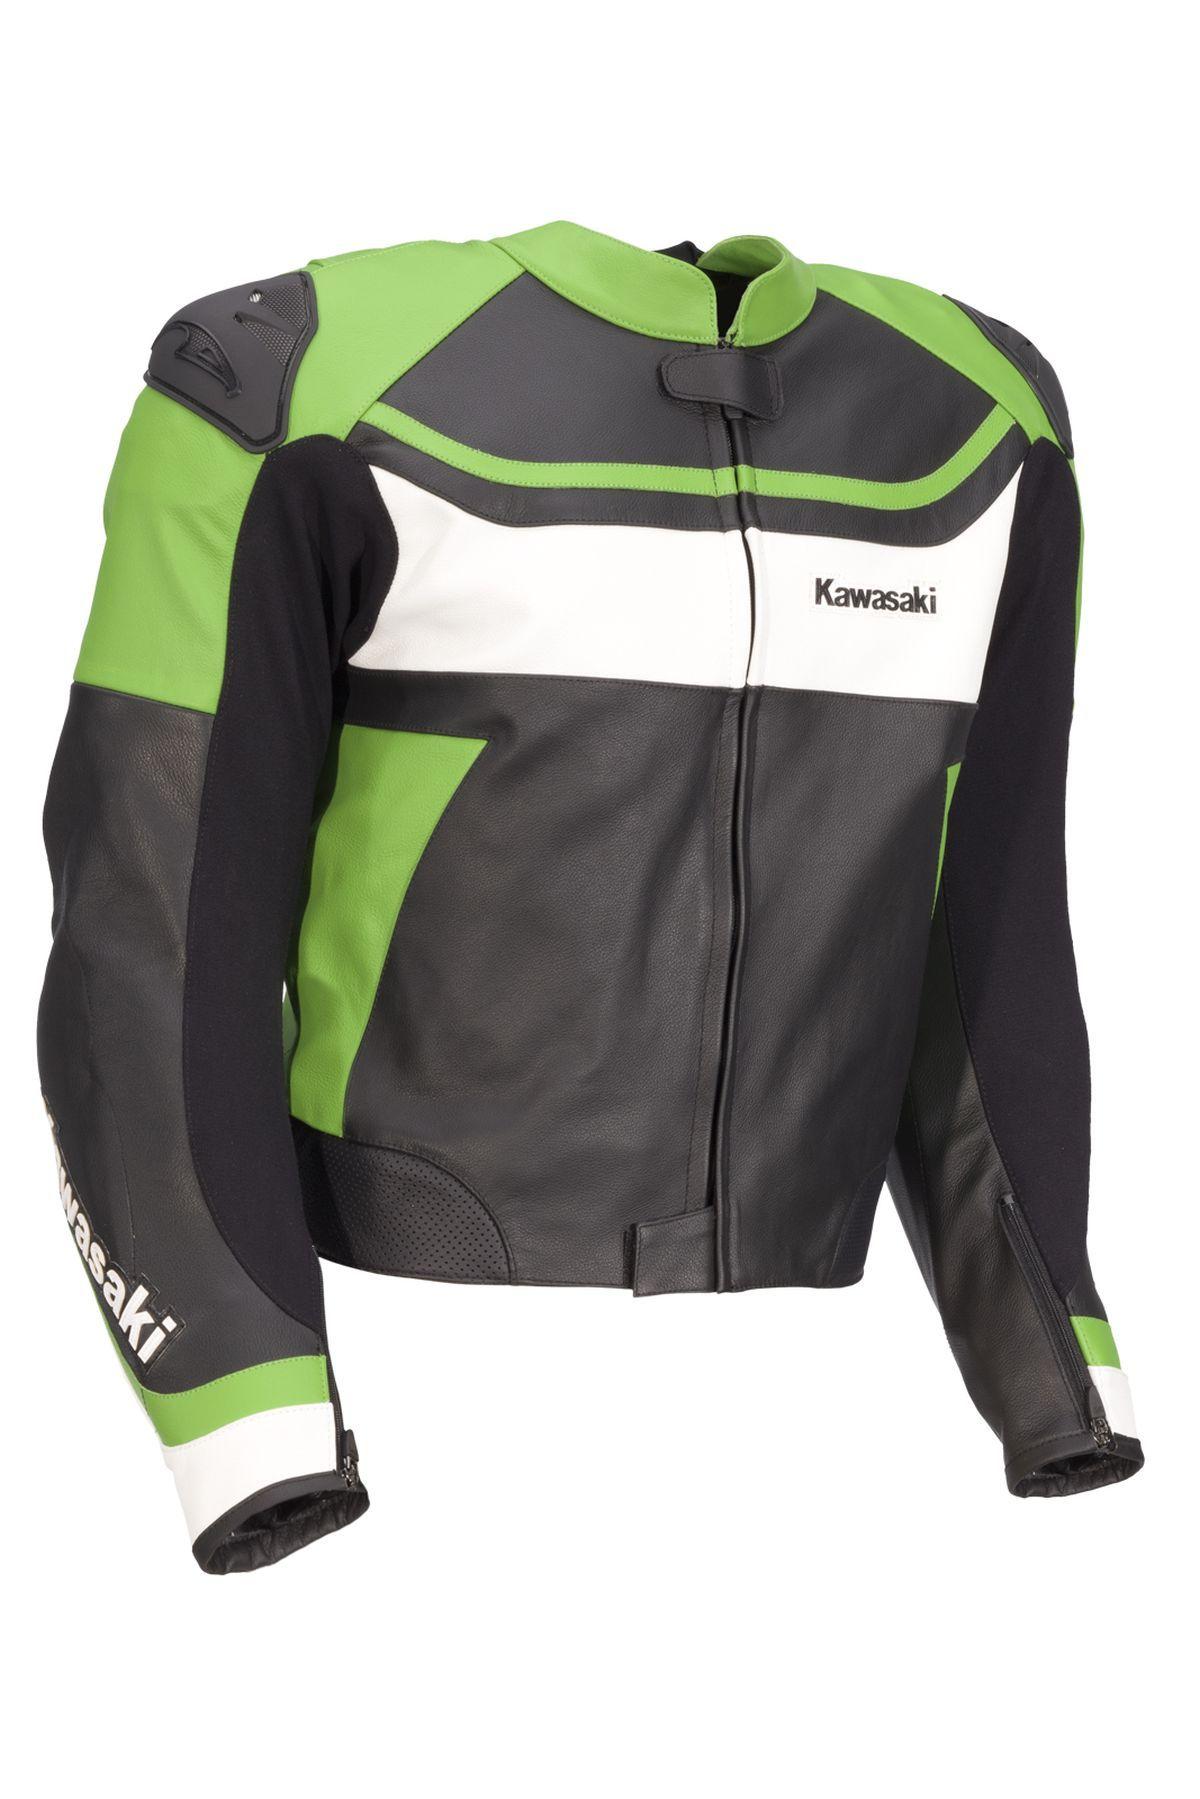 NINJA LEATHER JACKET Kawasaki jacket, Motorcycle jackets